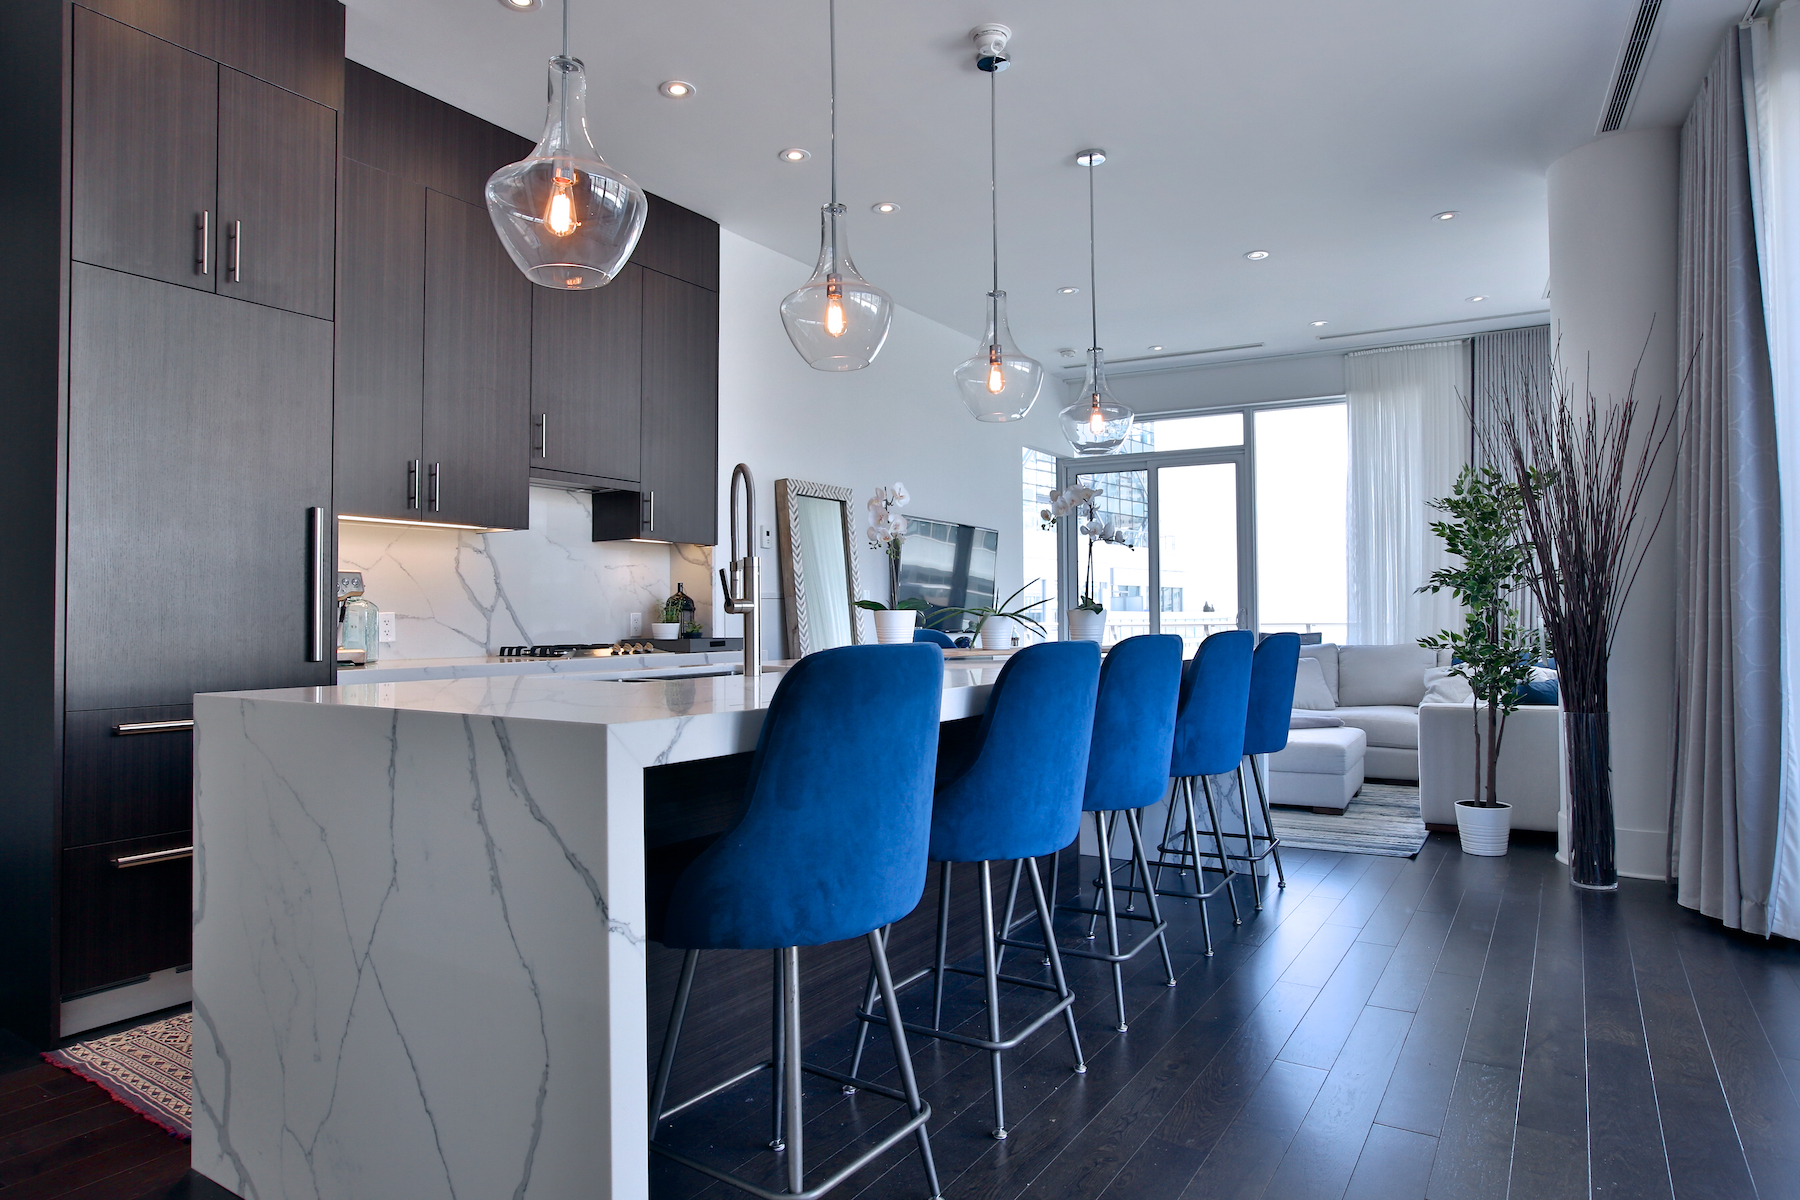 Stunning Refinished Kitchen with Custom Island